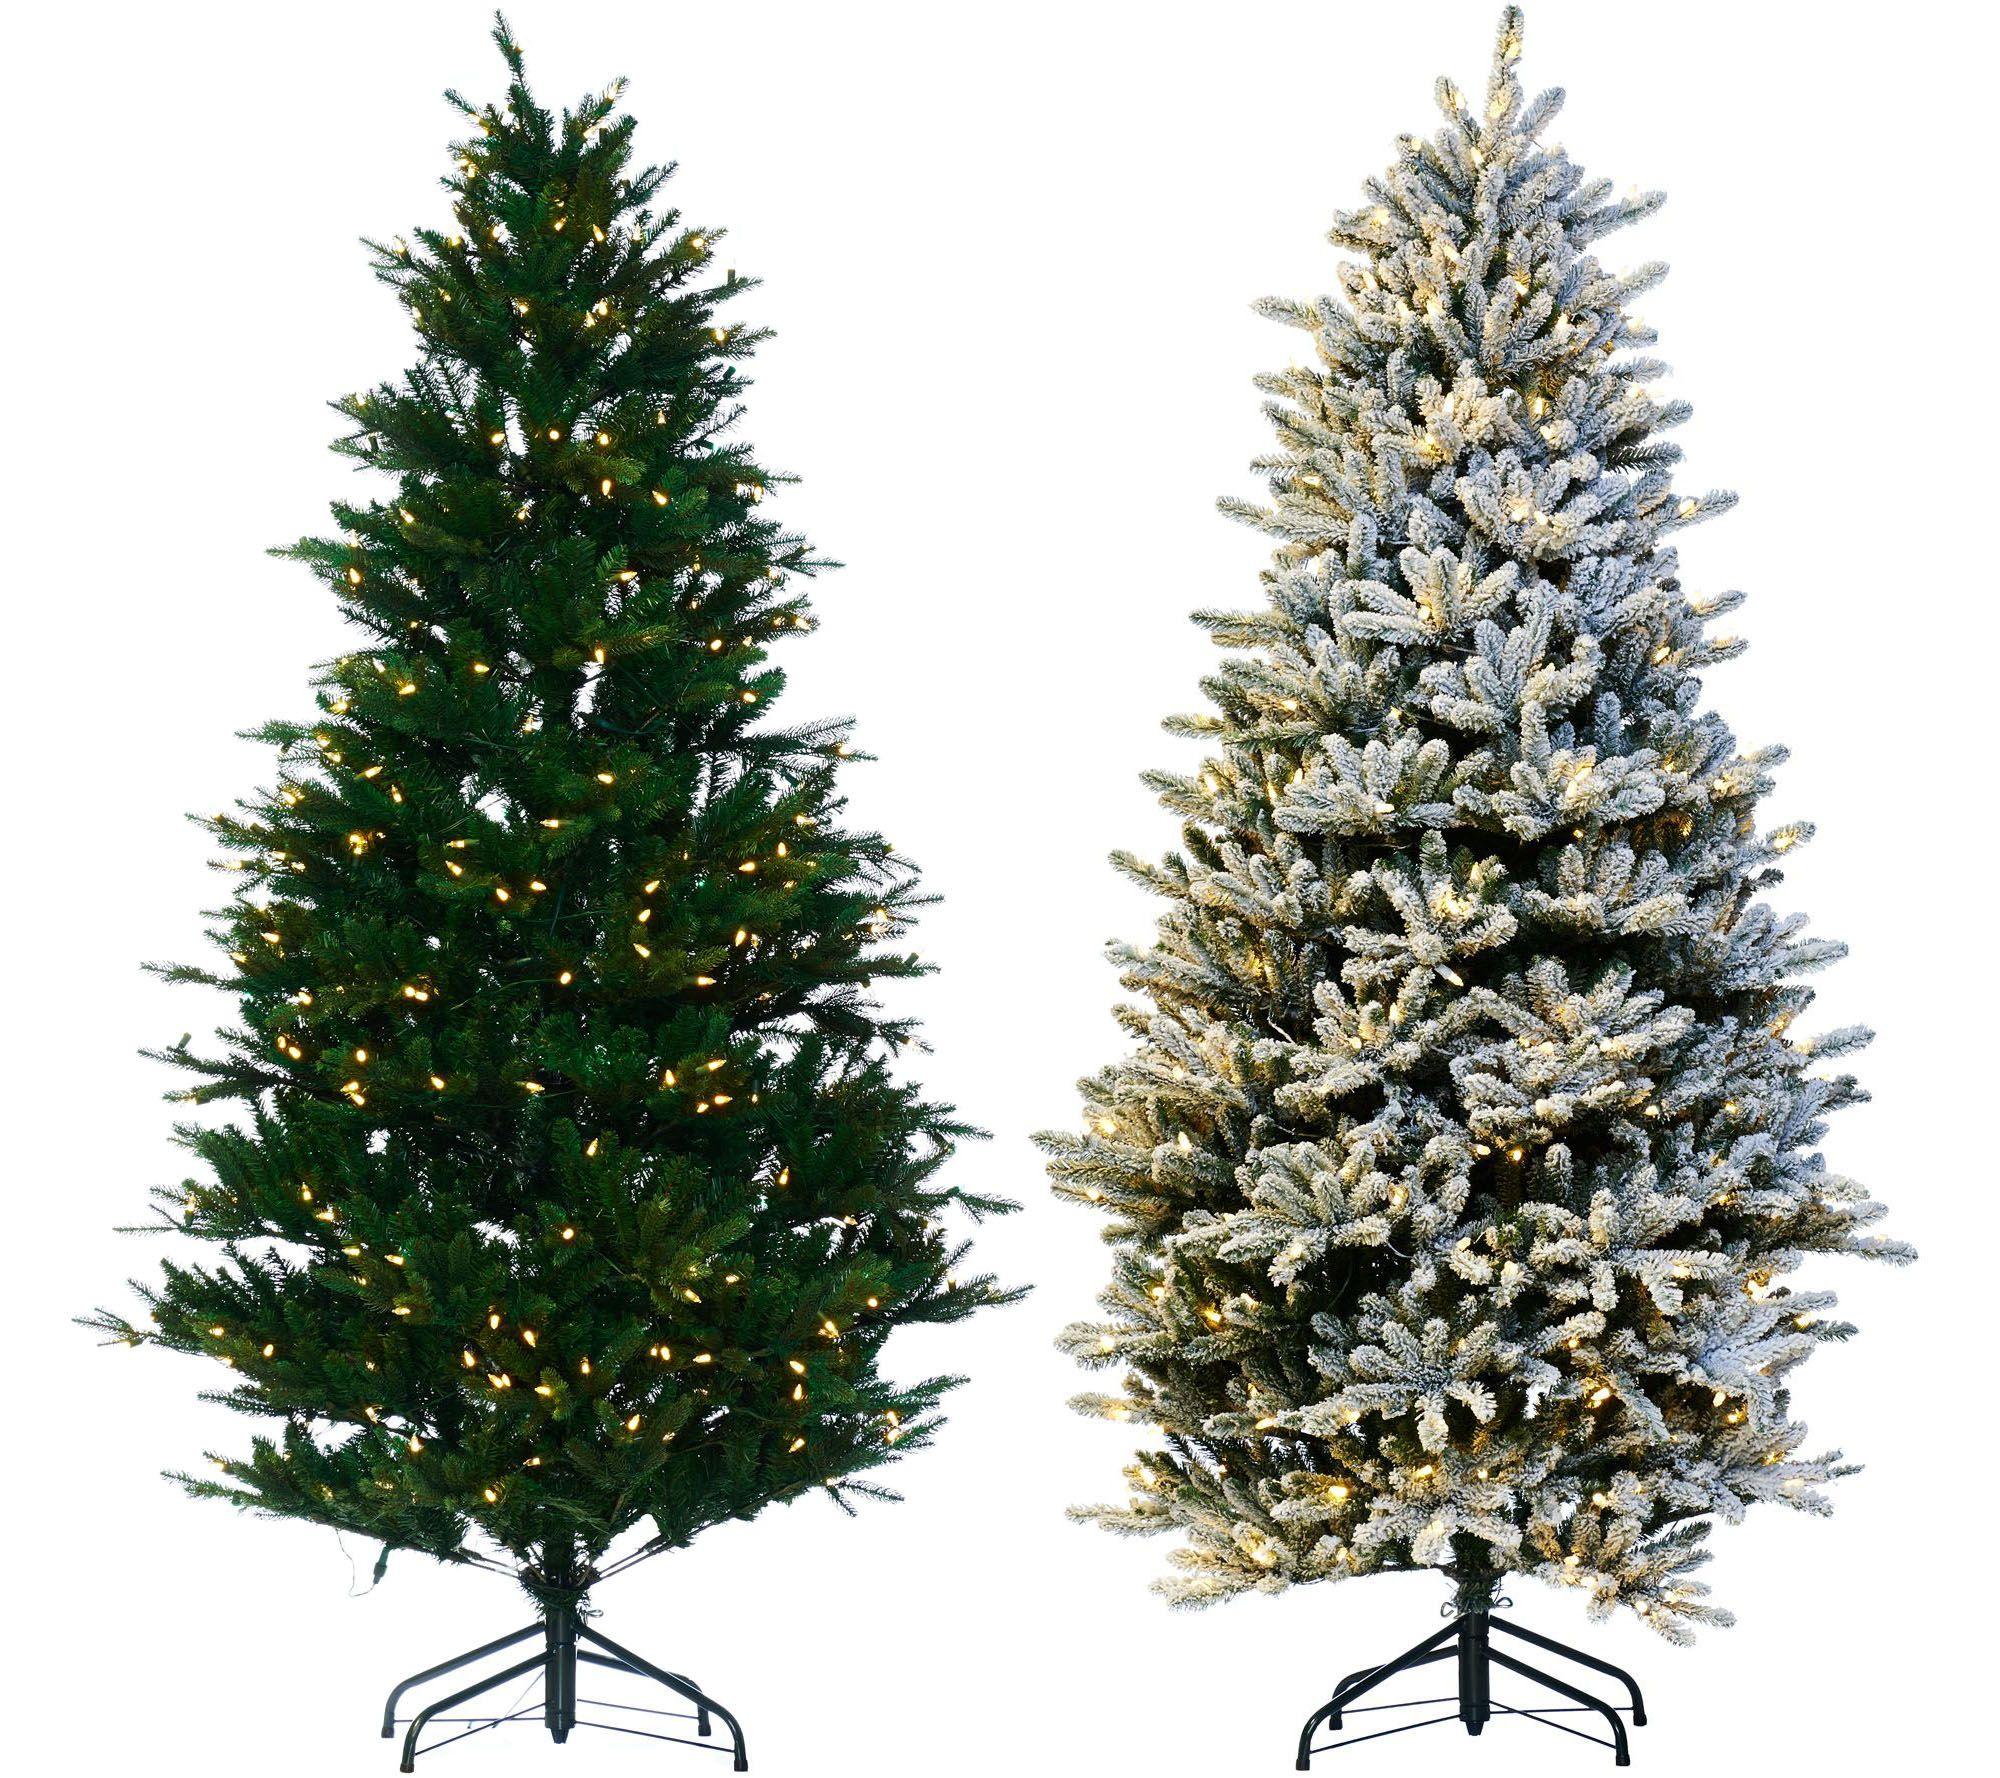 Santa's Best Balsam Fir Christmas Tree with RGB 2.0 Technology ...